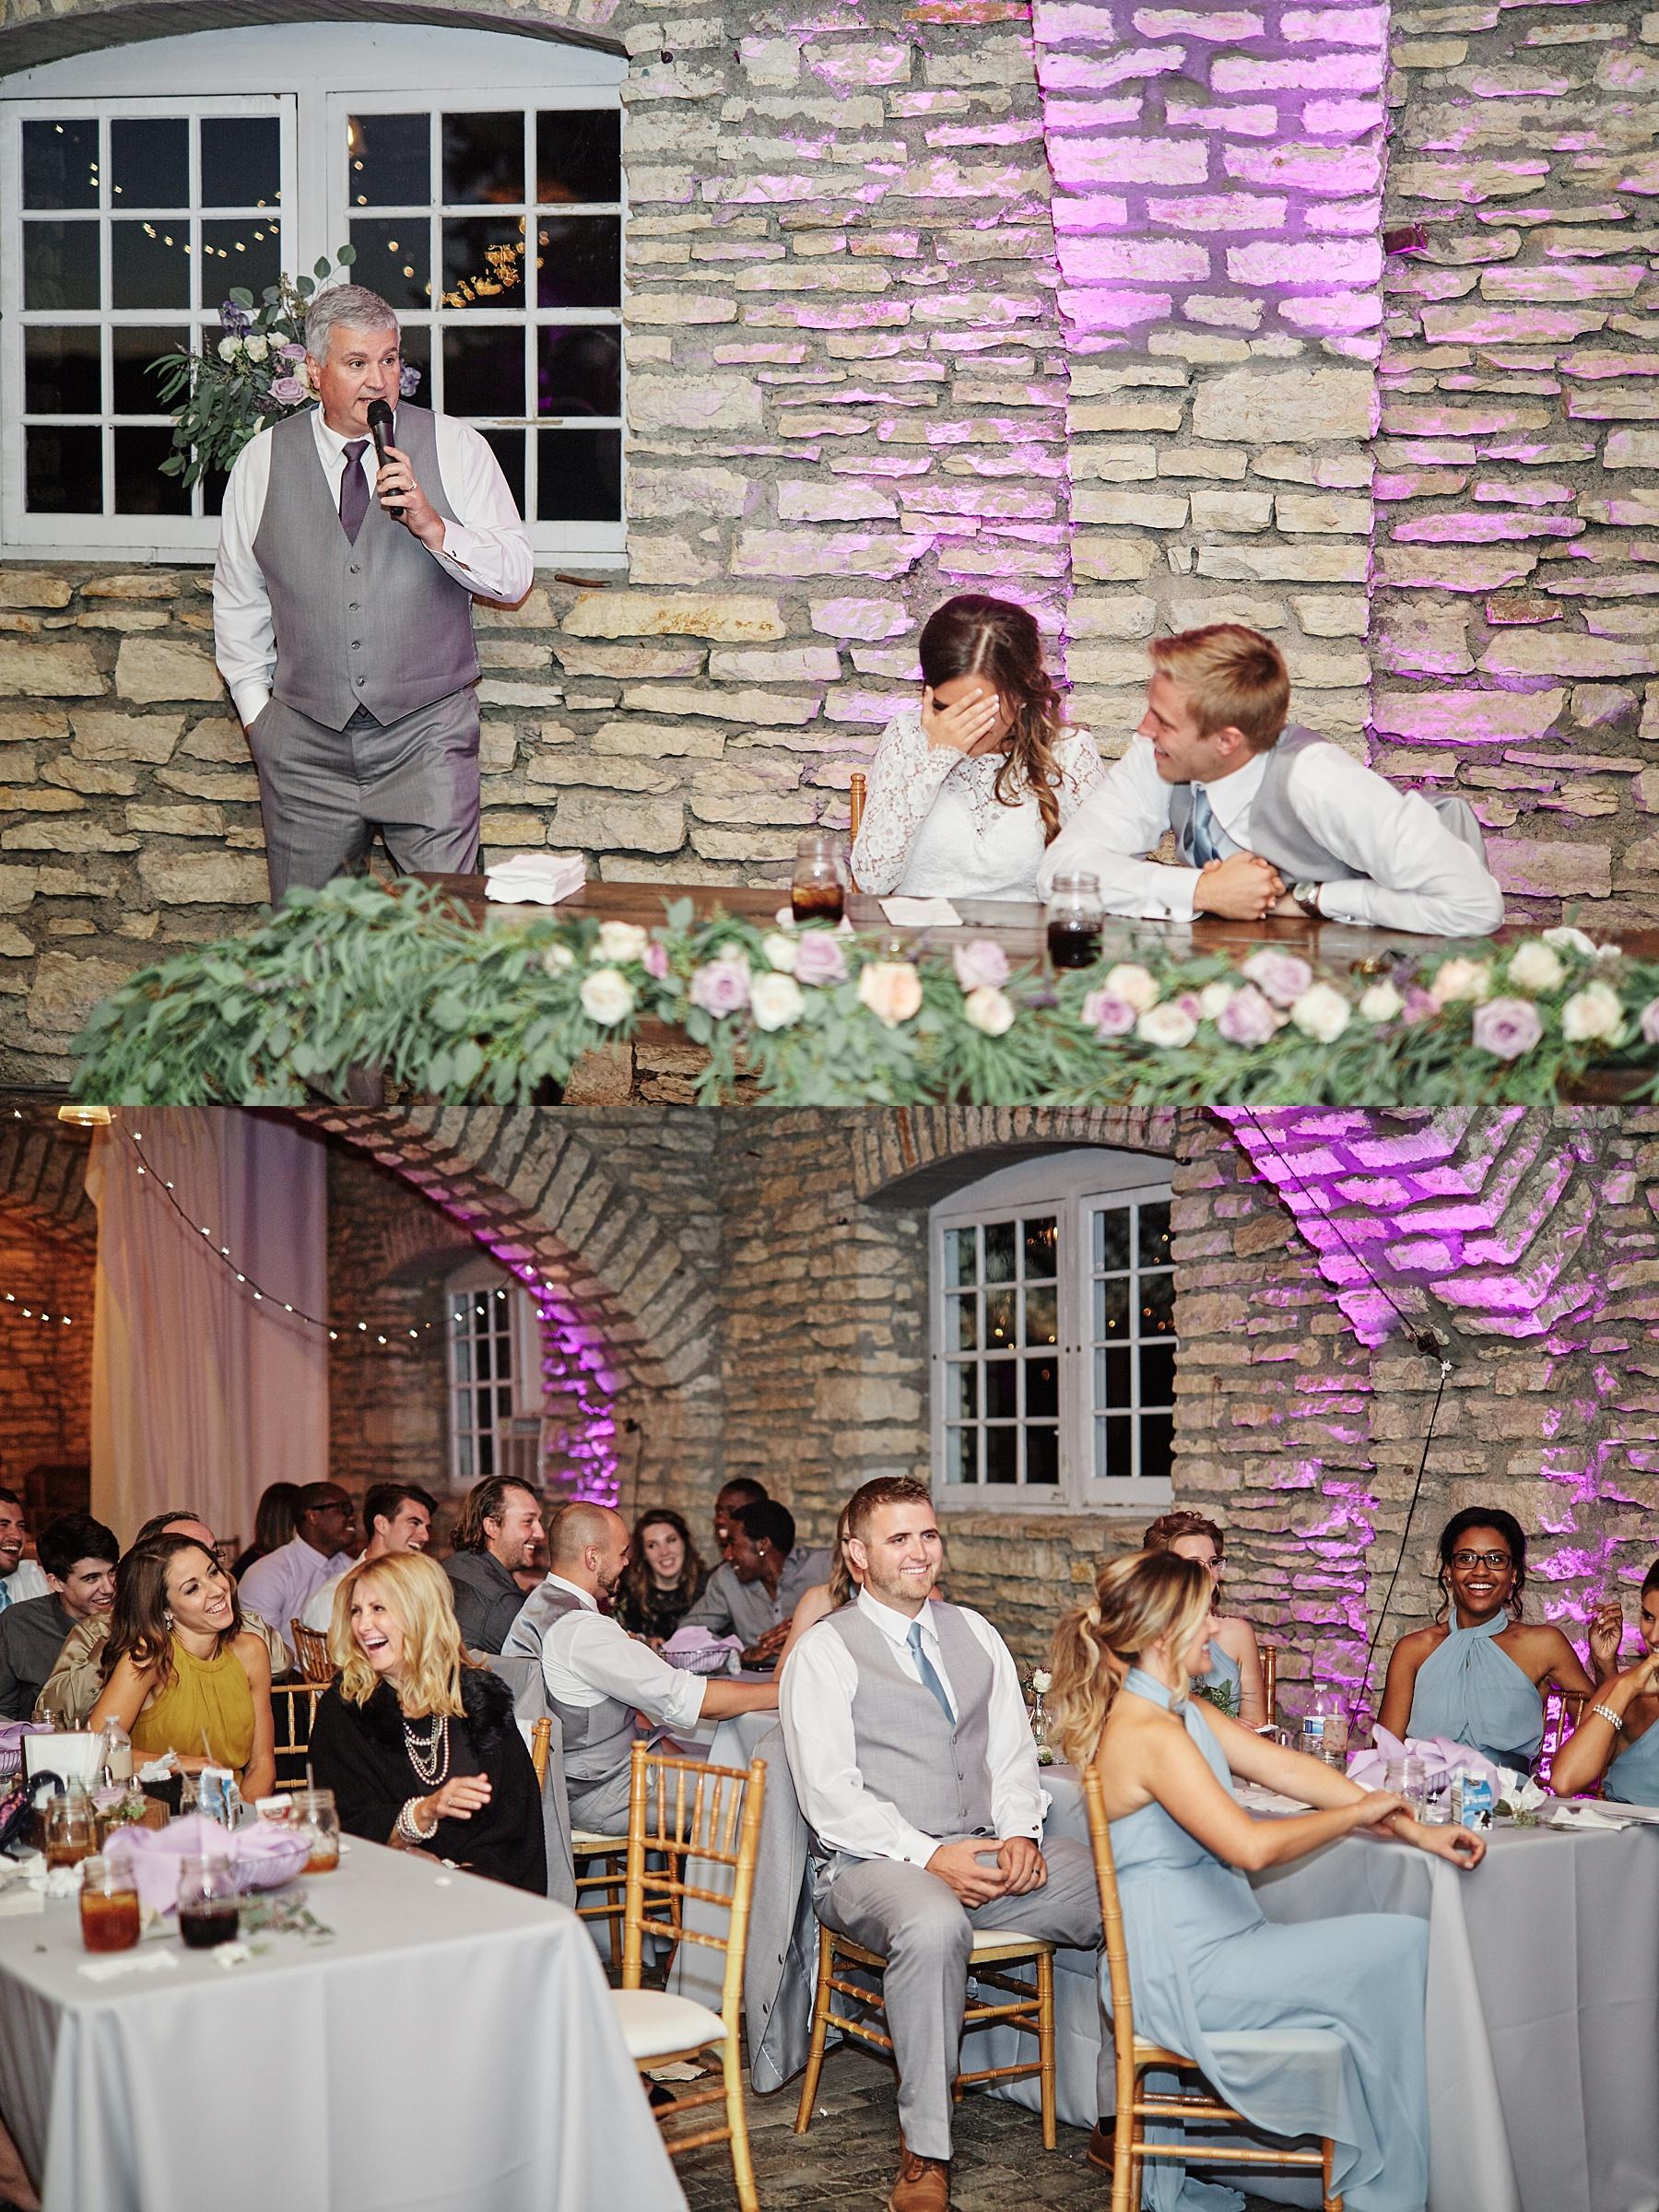 Maywood-Stone-Barn-Wedding-Rochester-Minnesota-Perry-James-Photo_0690.jpg